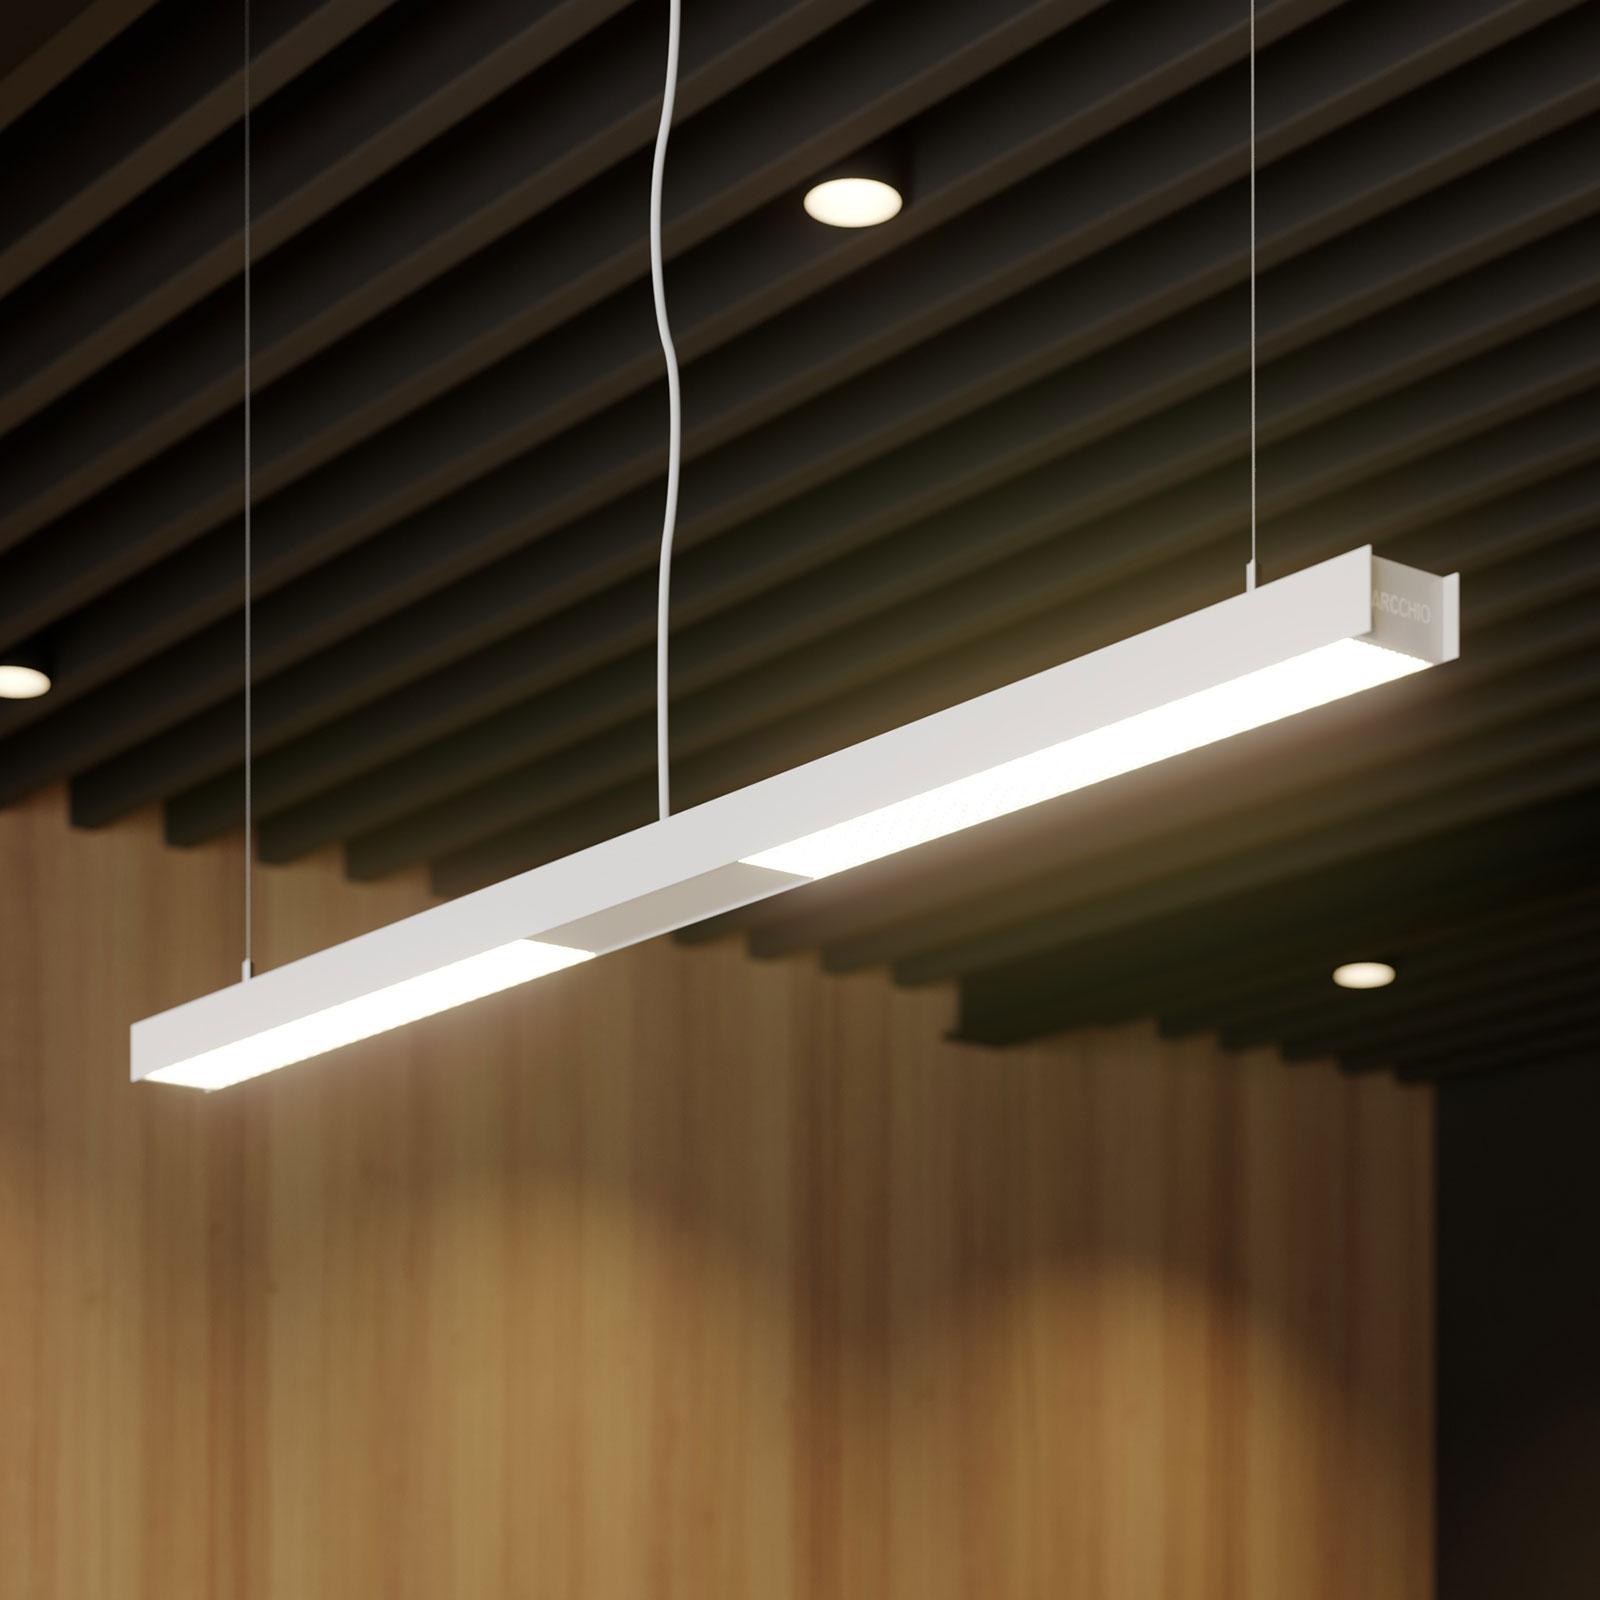 Arcchio Rontan biurowa lampa wisząca LED, biała